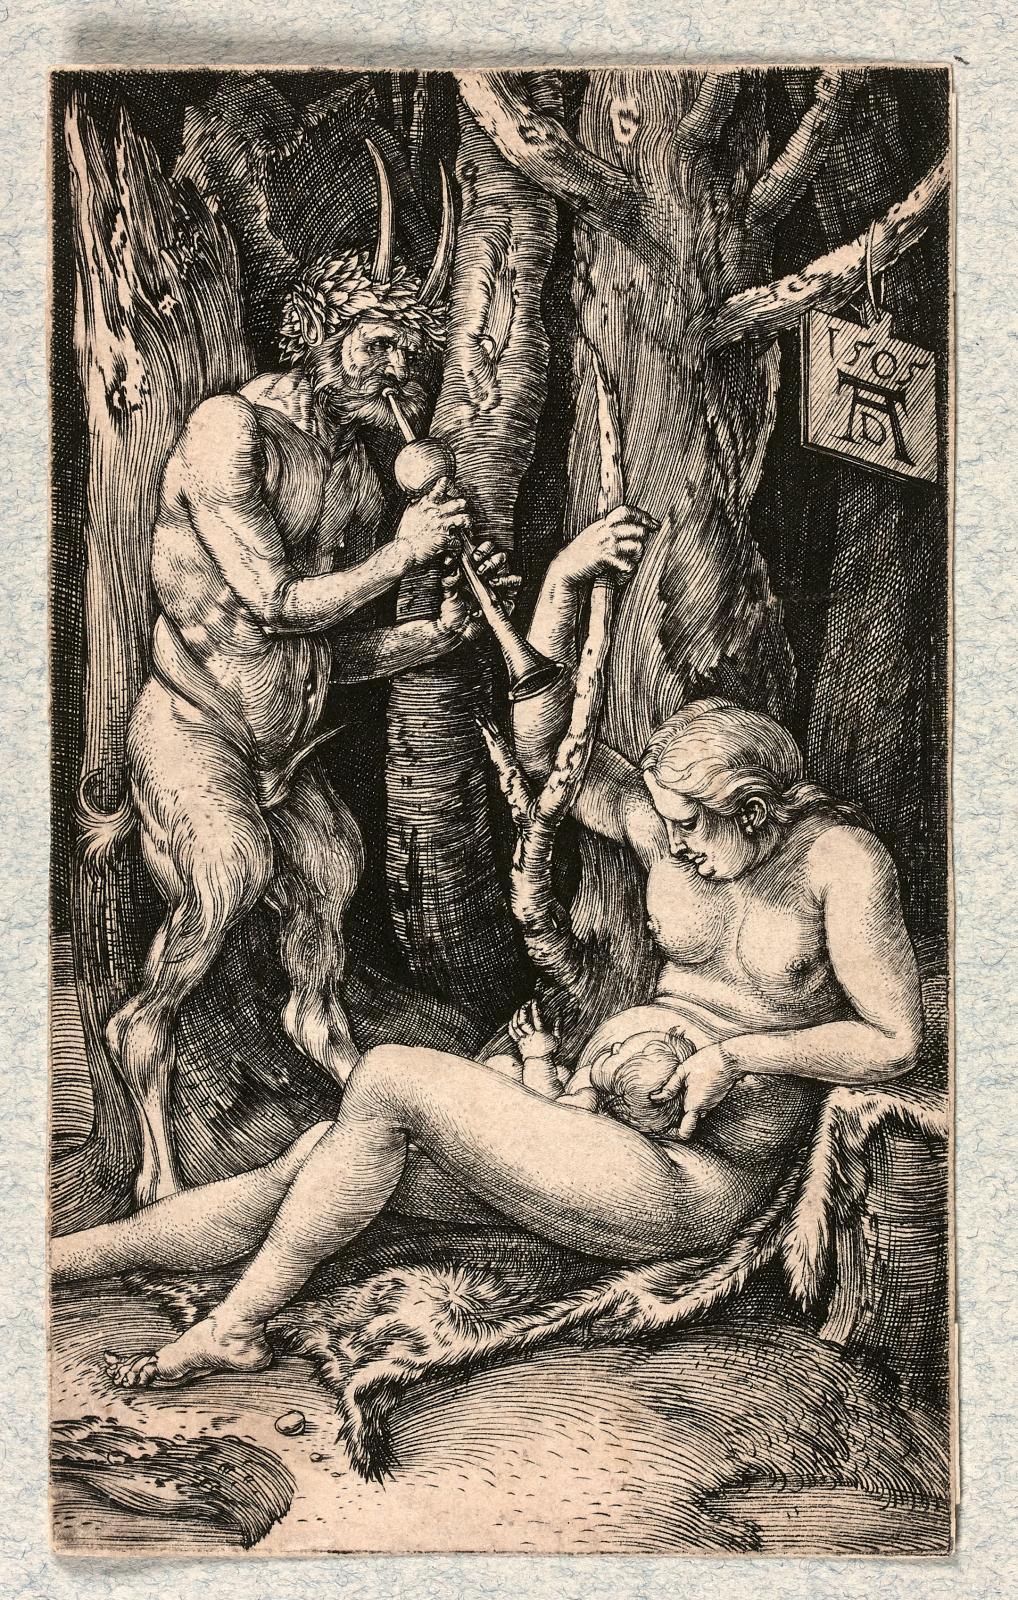 Albrecht Dürer (1471-1528), La Famille du satyre,1505, burin, 11,6x7cm. Estimation: 35000€